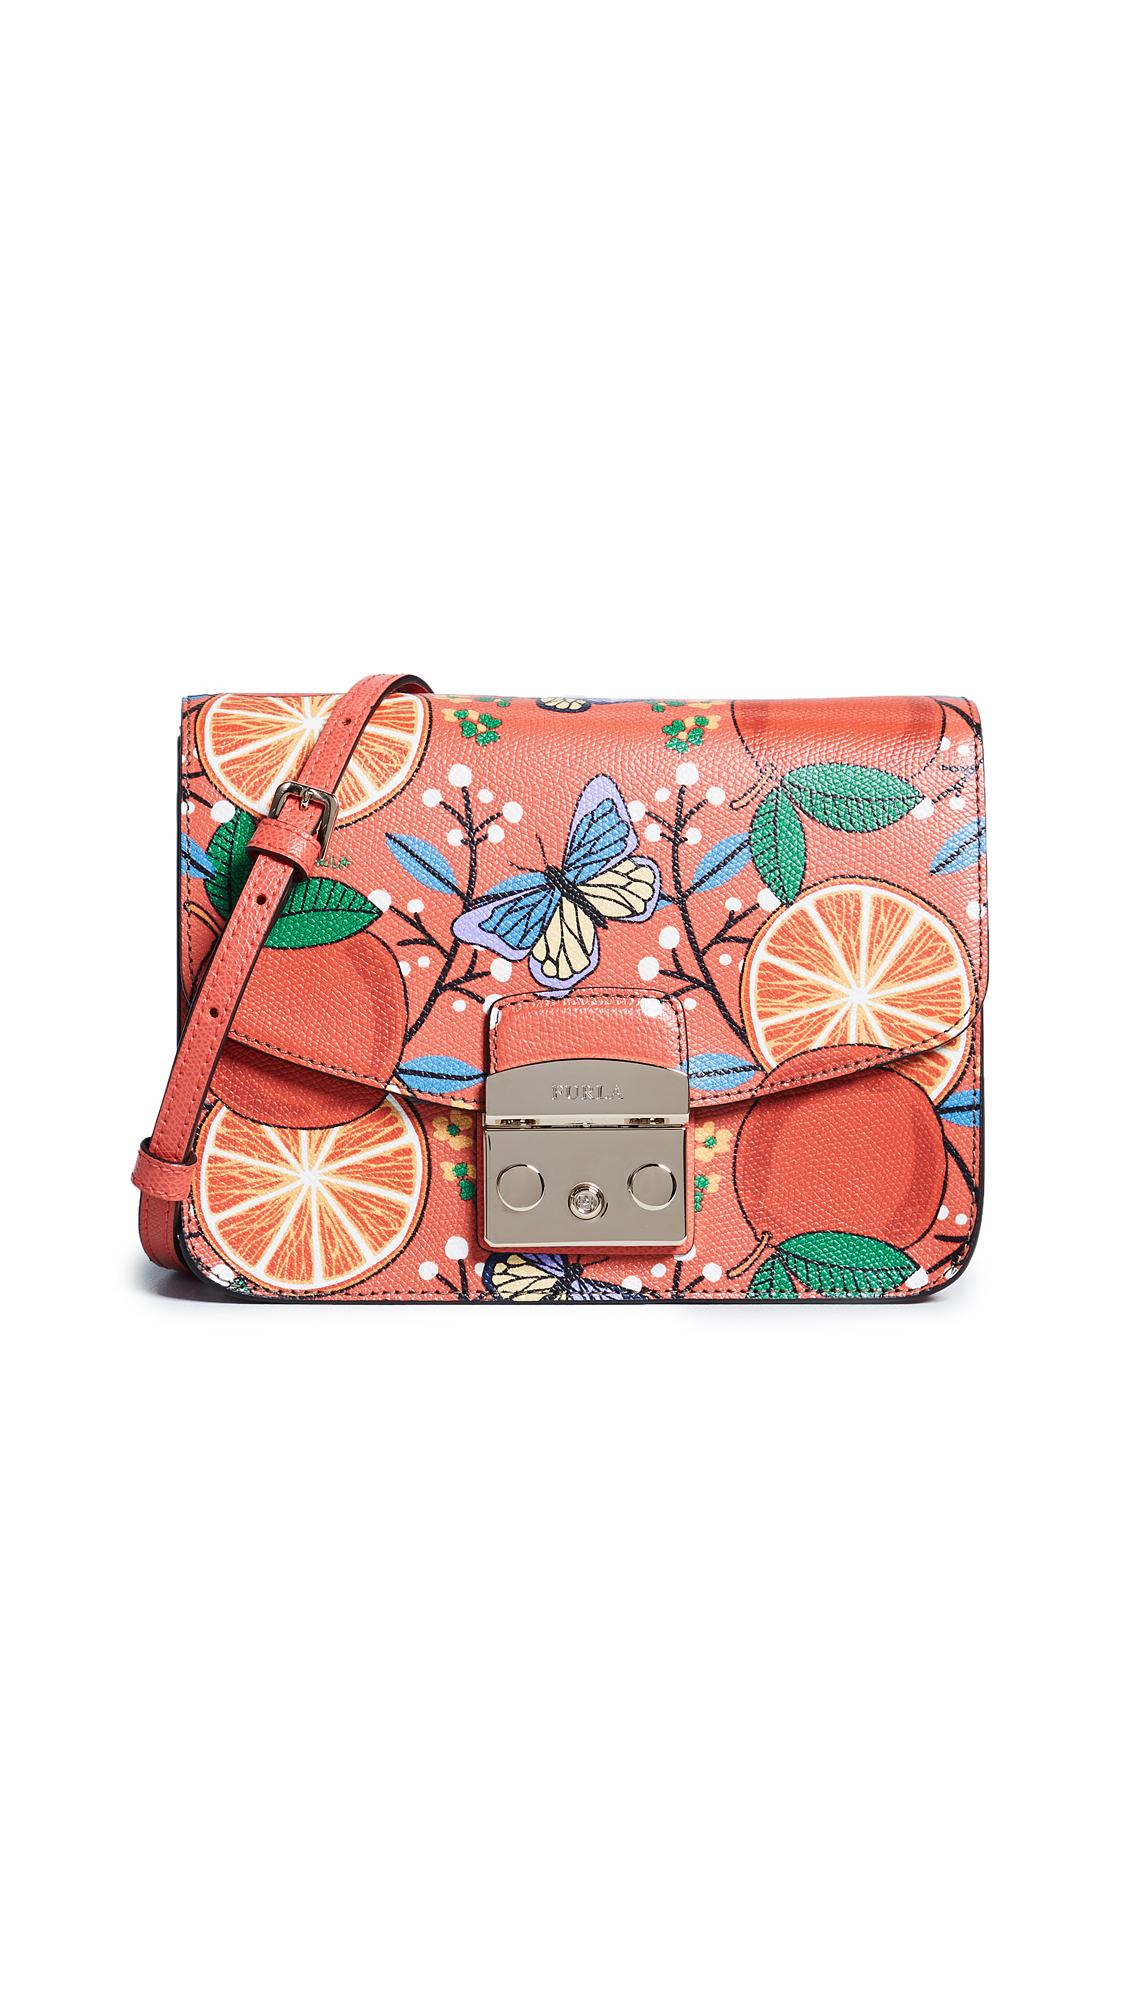 Furla Metropolis Small Orange Cross Body Bag